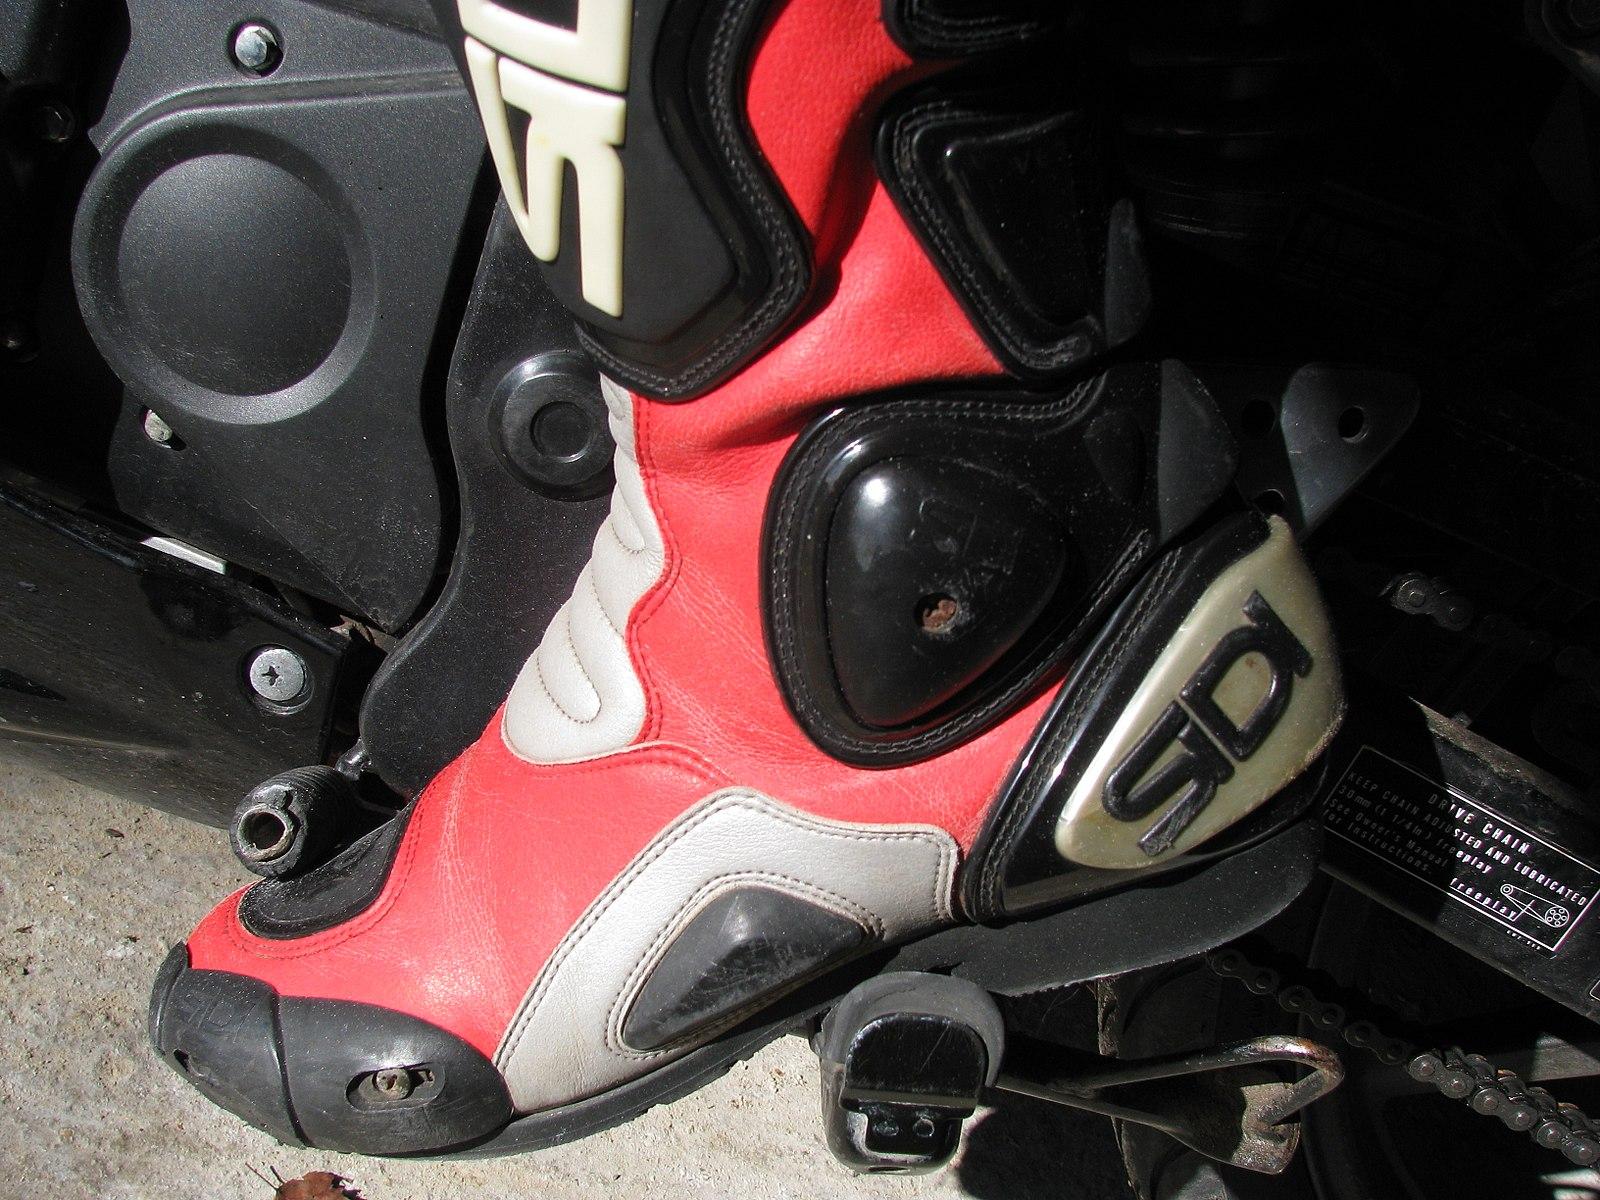 Dirt bike boots.jpg